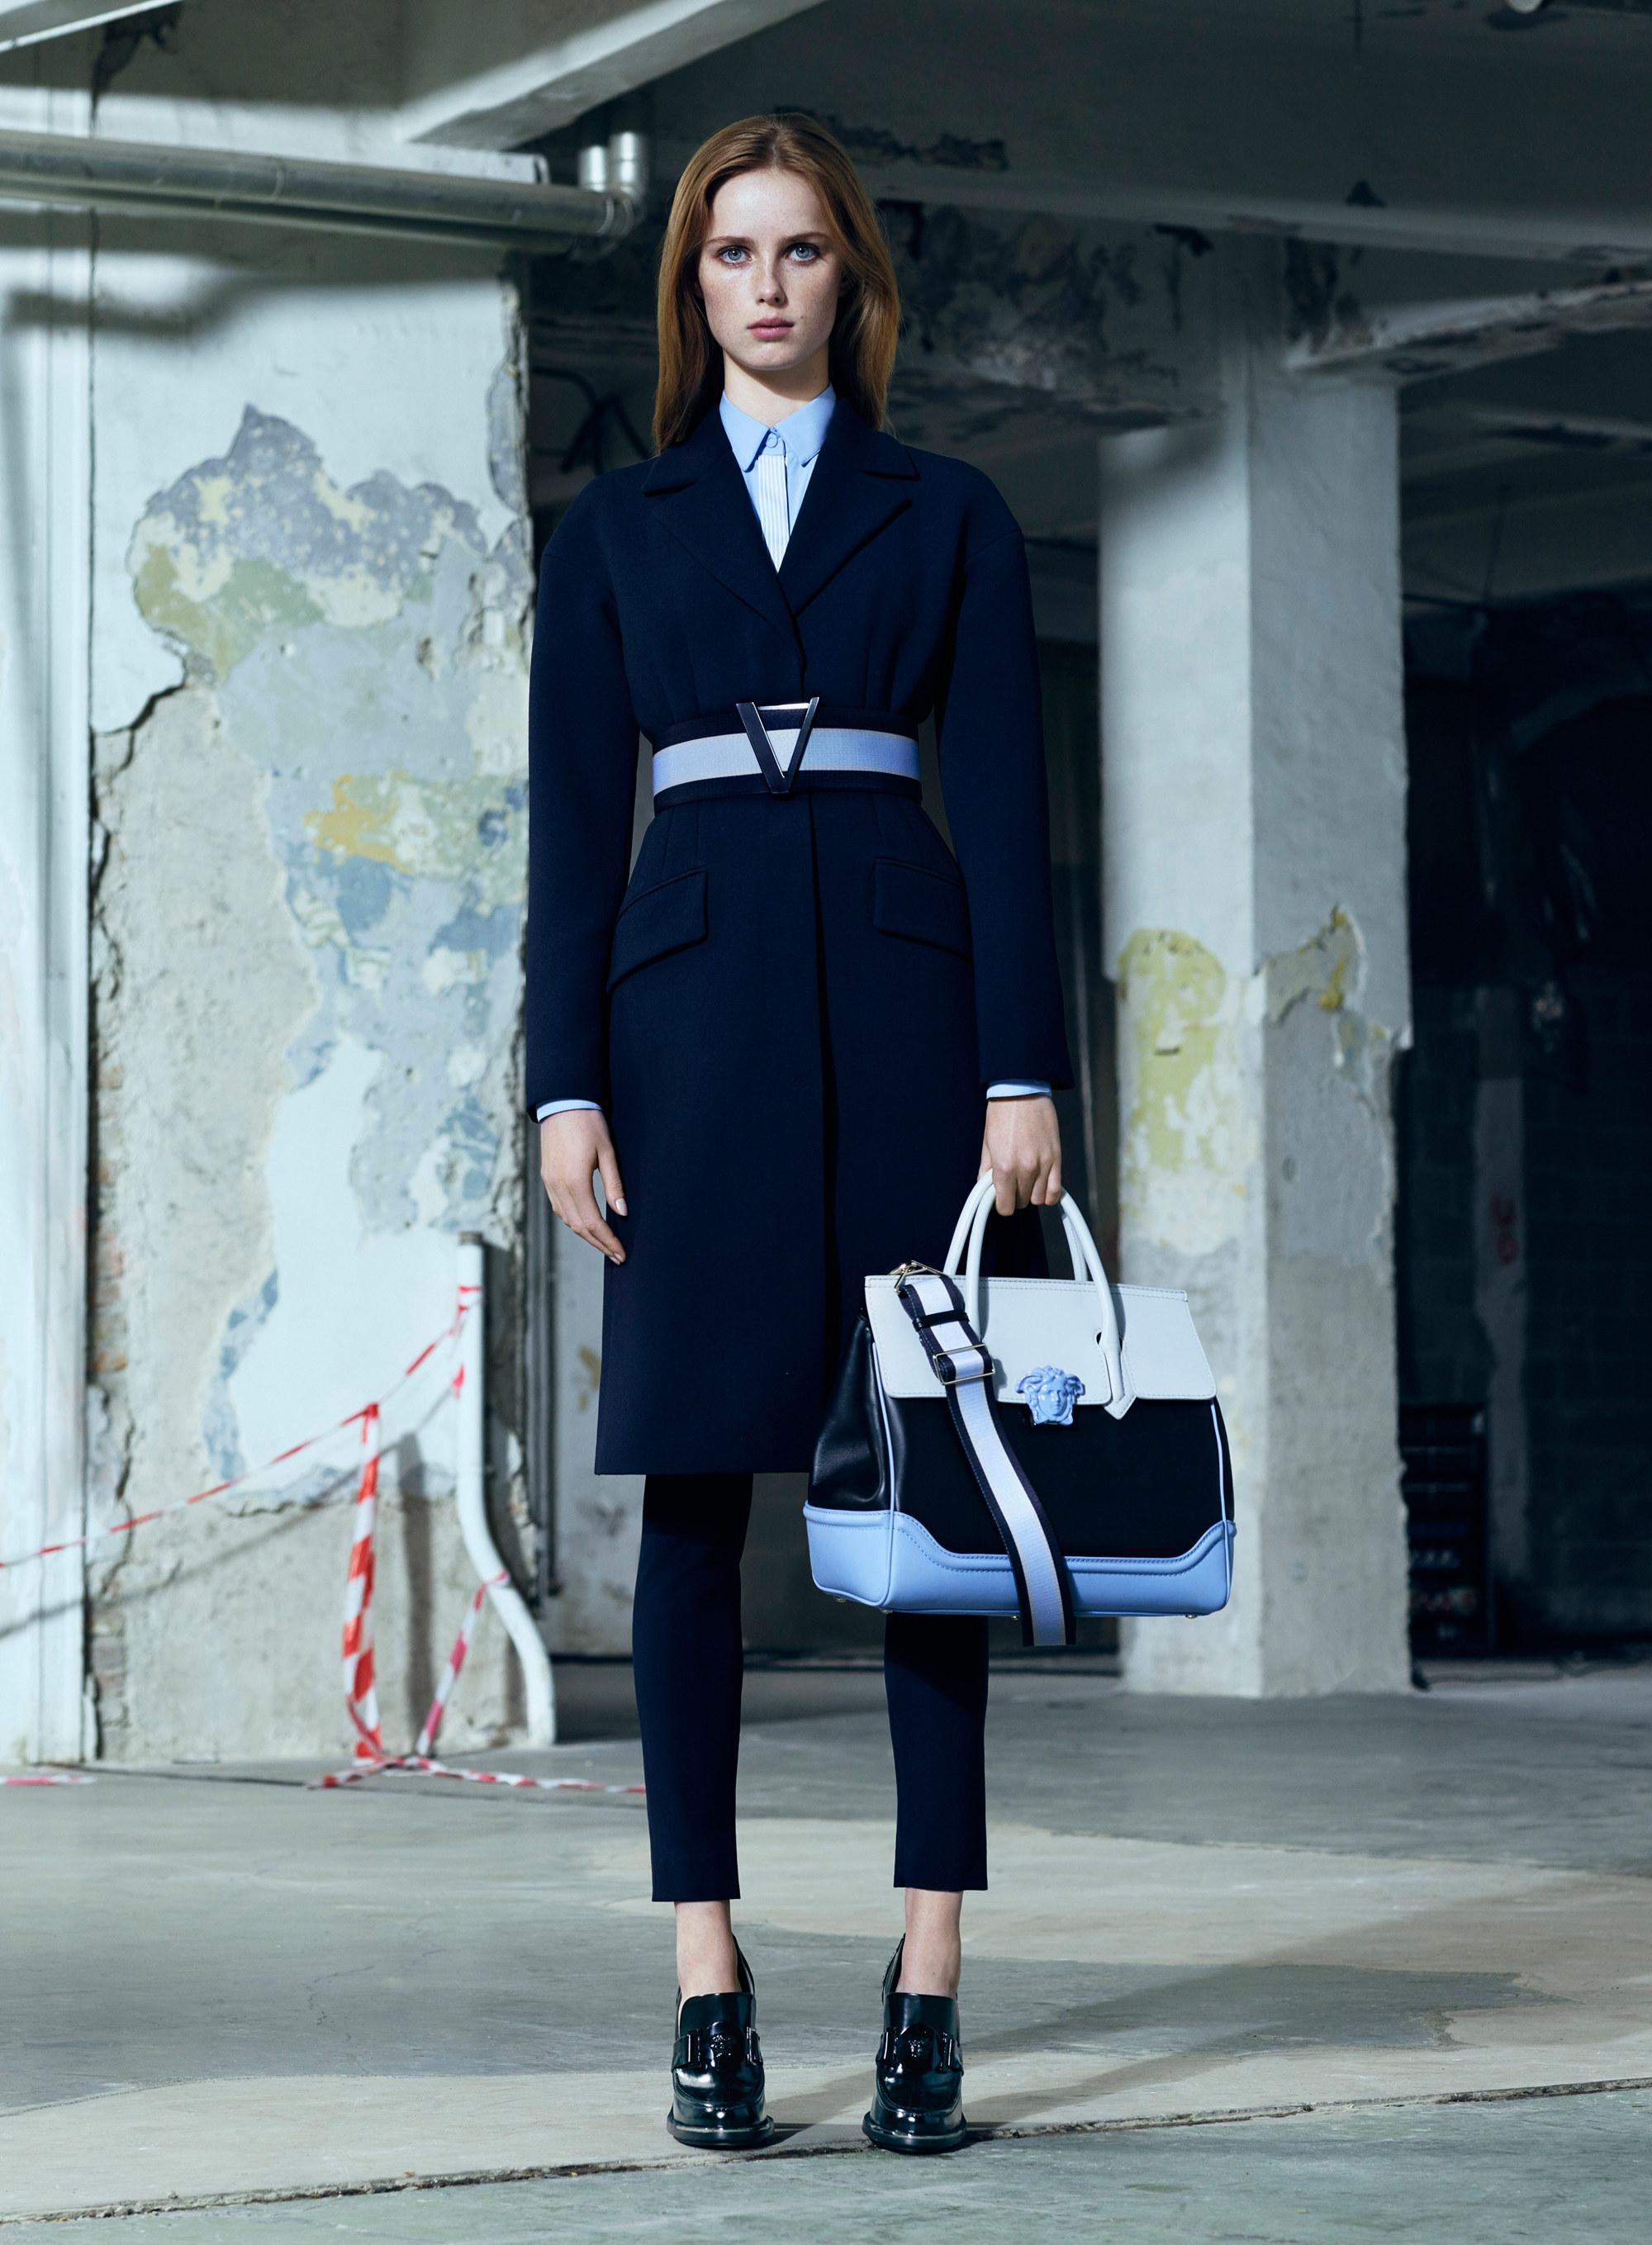 versace-pre-fall-2016-lookbook-01